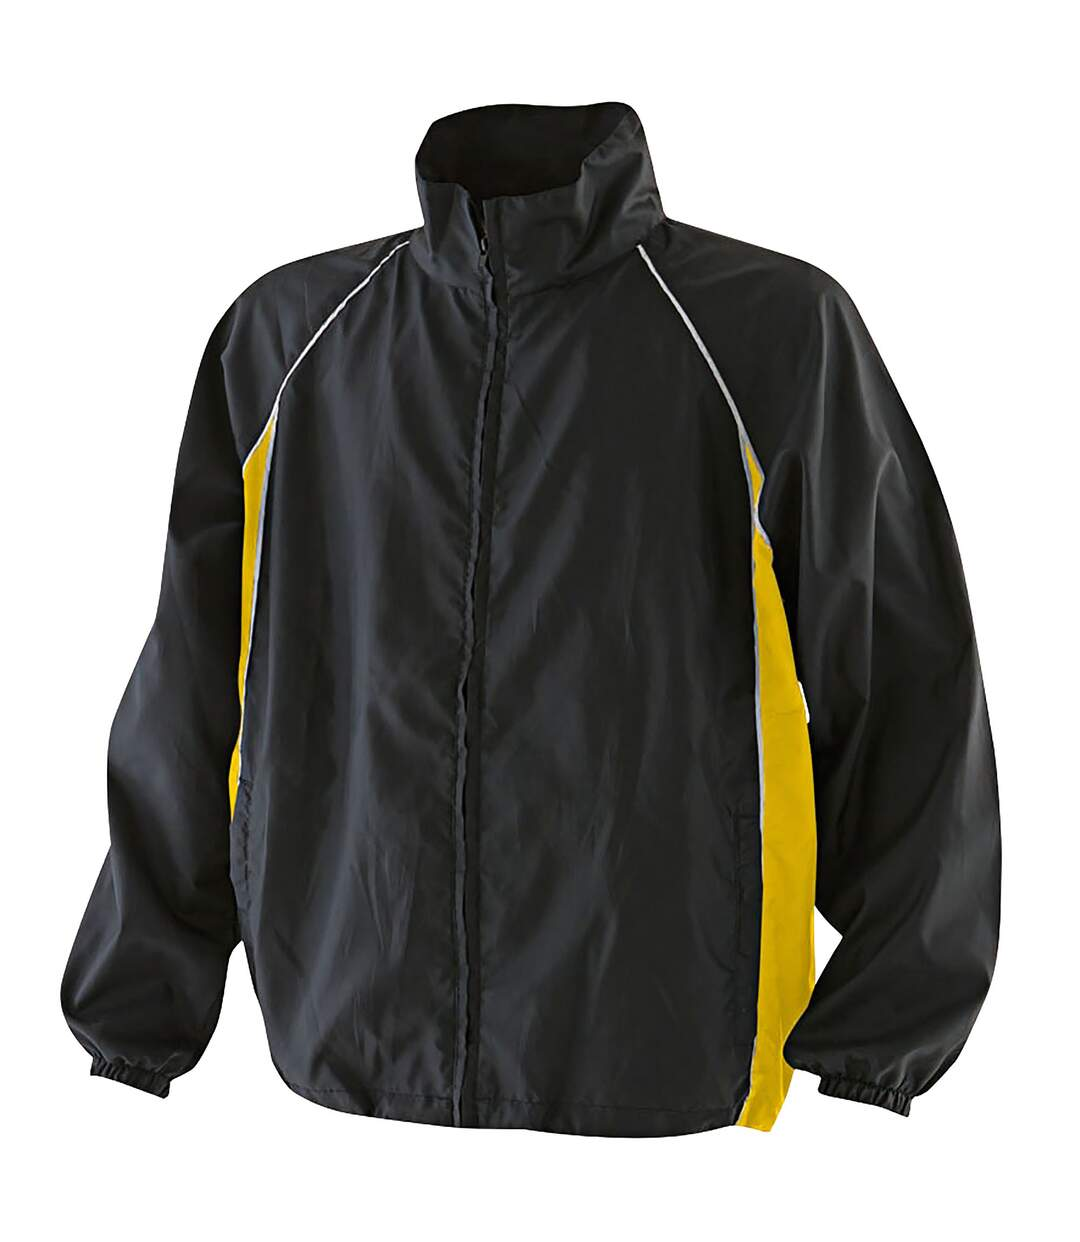 Finden & Hales Mens Piped Showerproof Full Zip Sports Training Jacket (Black/Black/White) - UTRW440